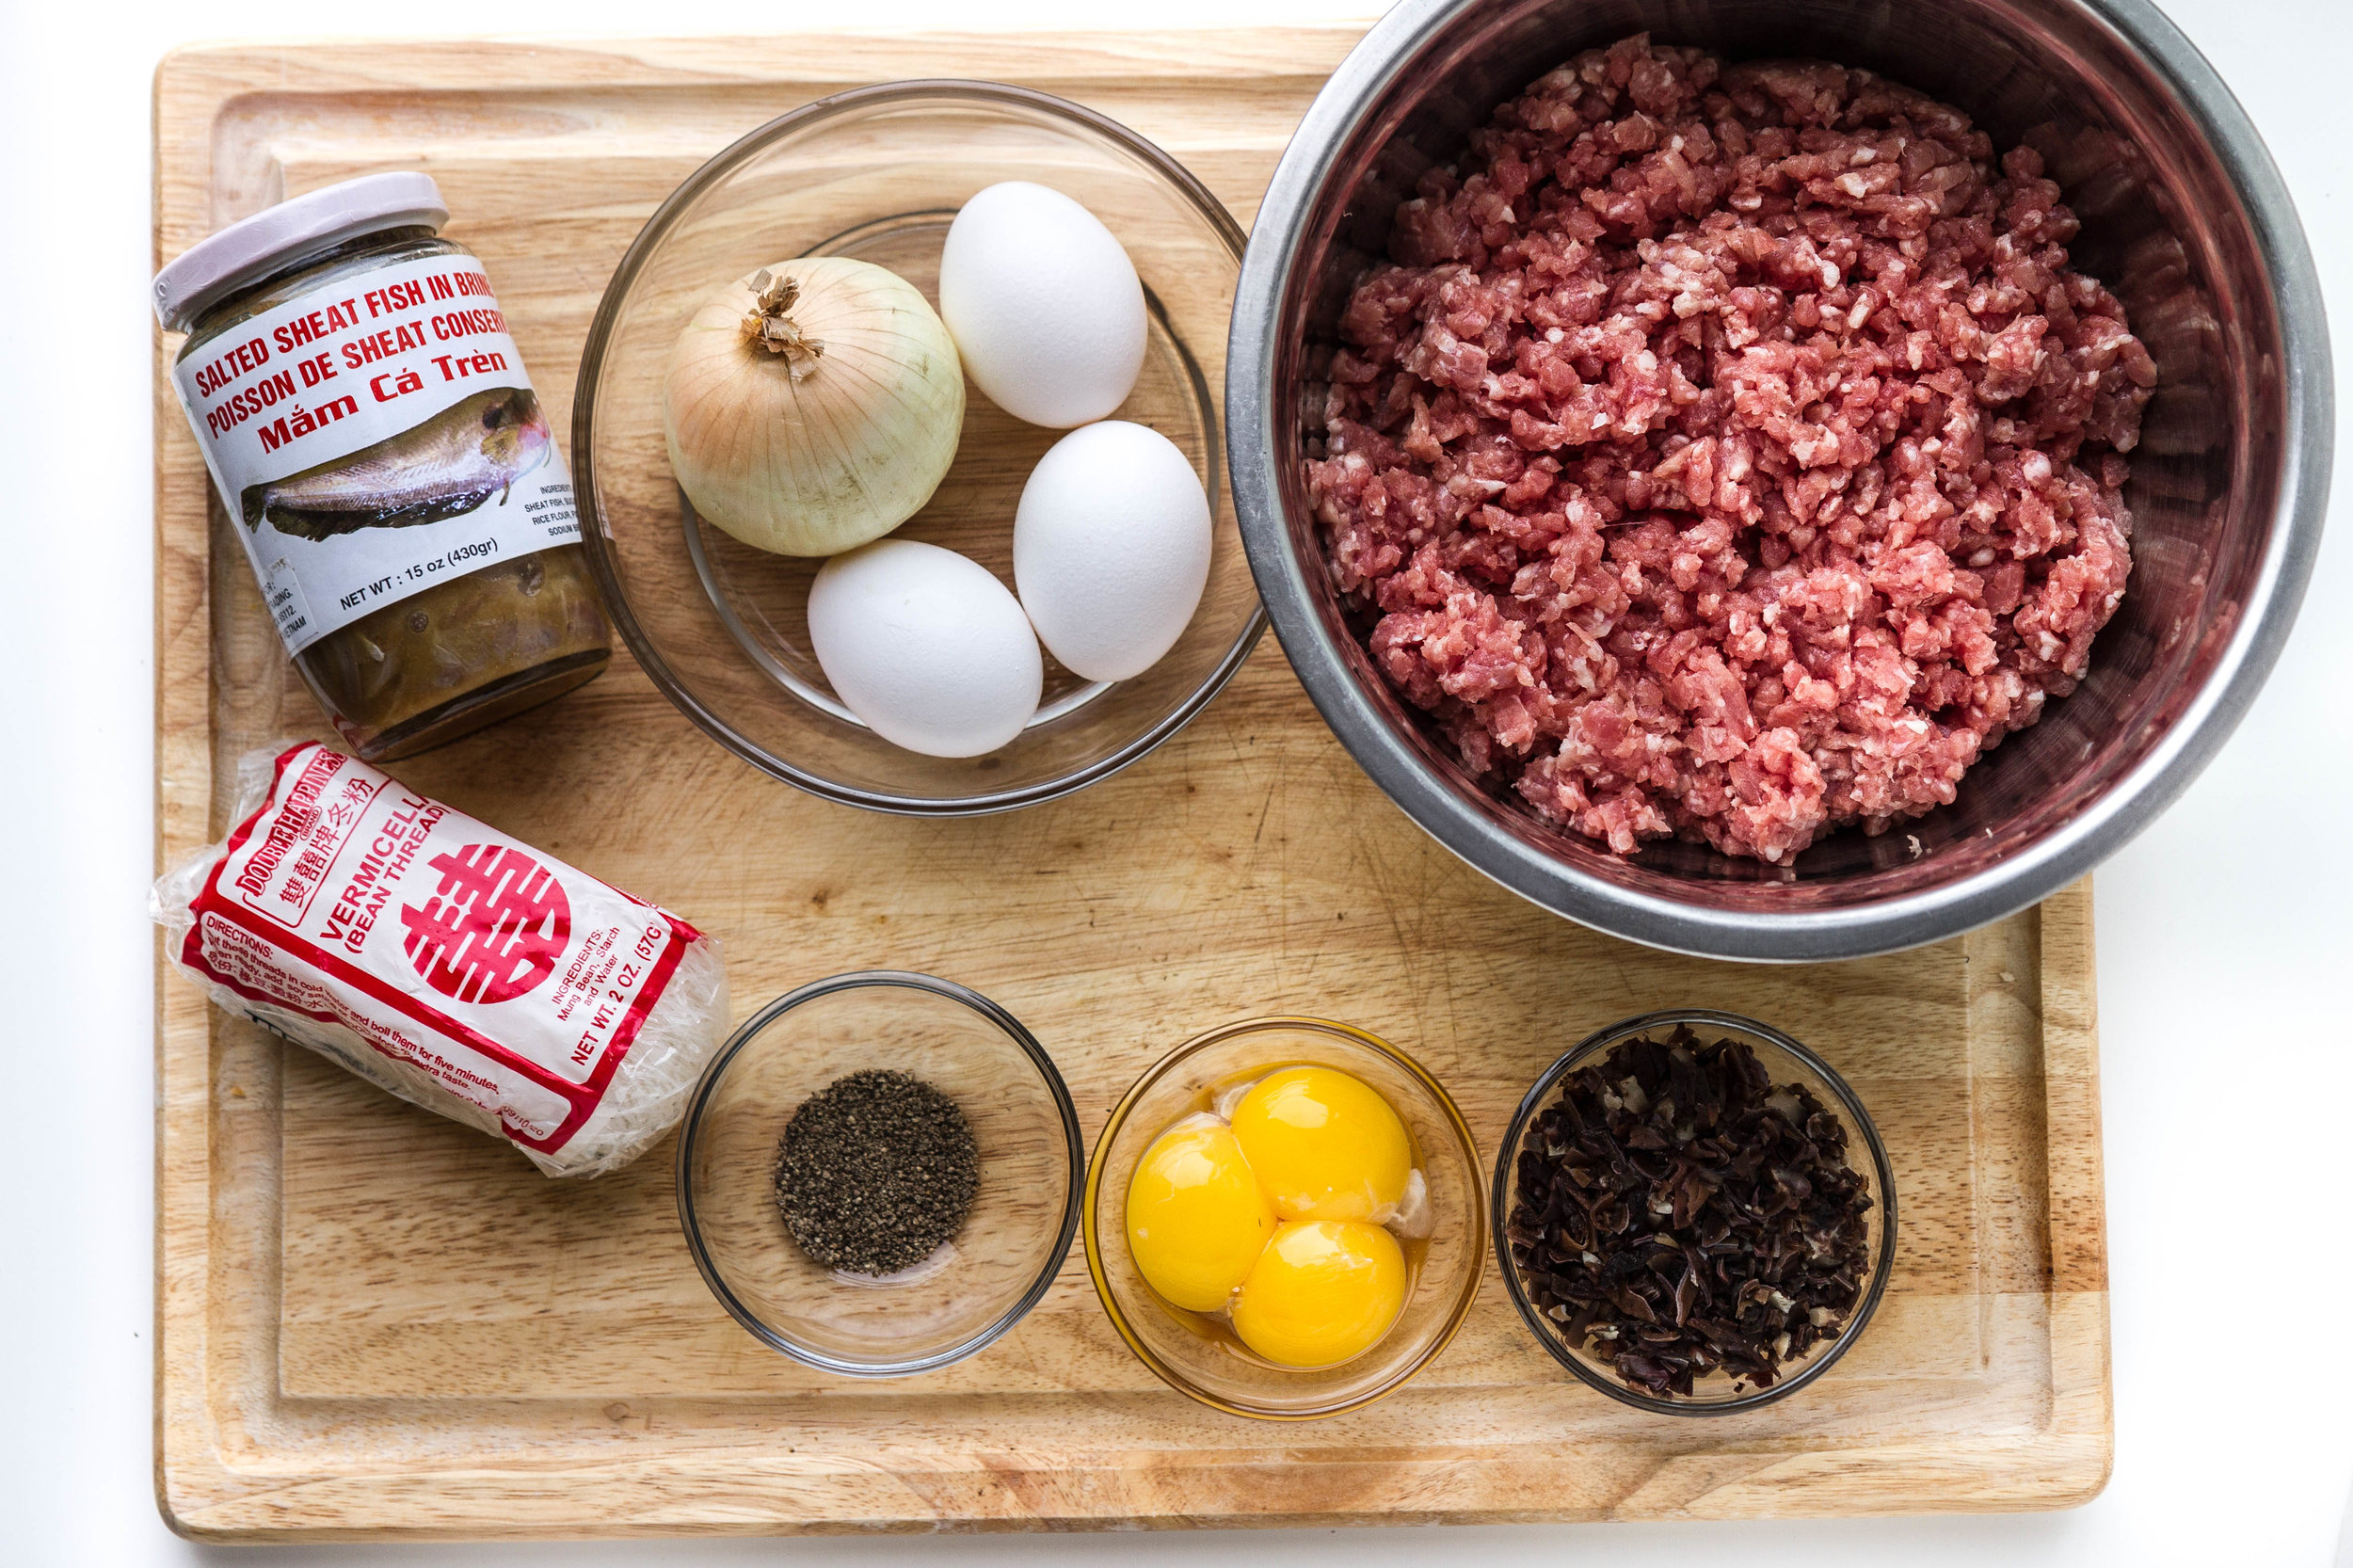 Mắm Chưng ingredients:  Mắm cá trèn, white onion, eggs, ground pork, bean thread vermicelli noodles, pepper, egg yolks and wood ear mushrooms.